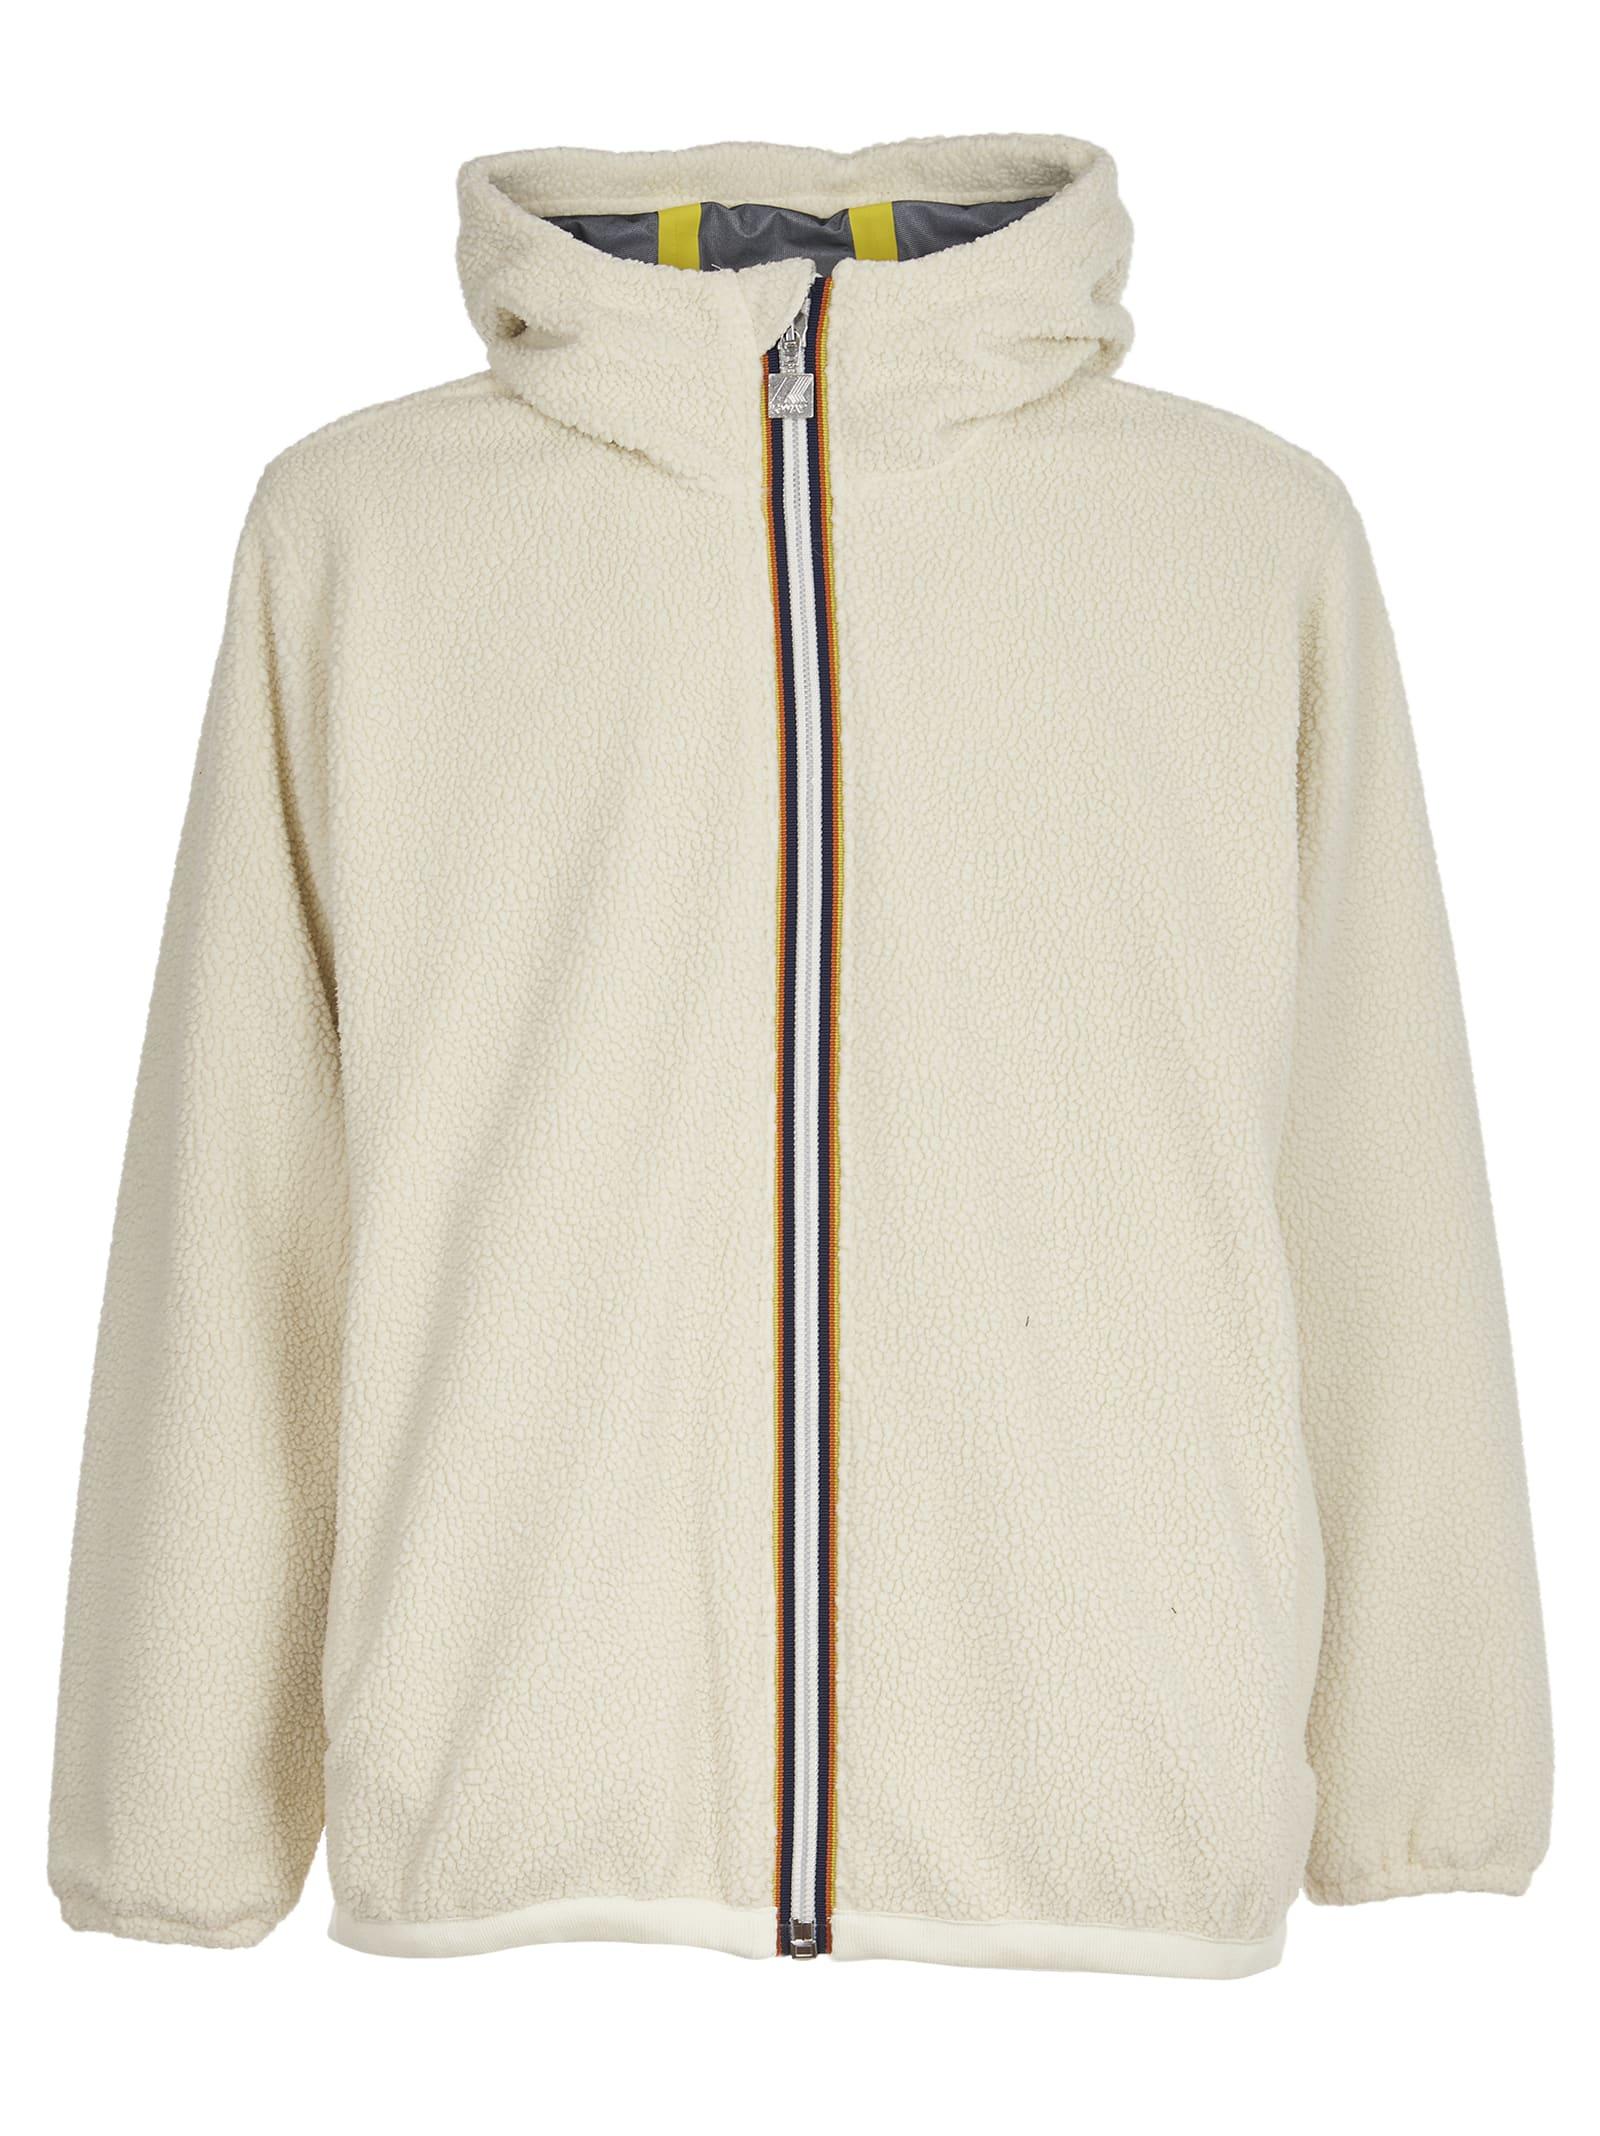 Claude Shirling Jacket